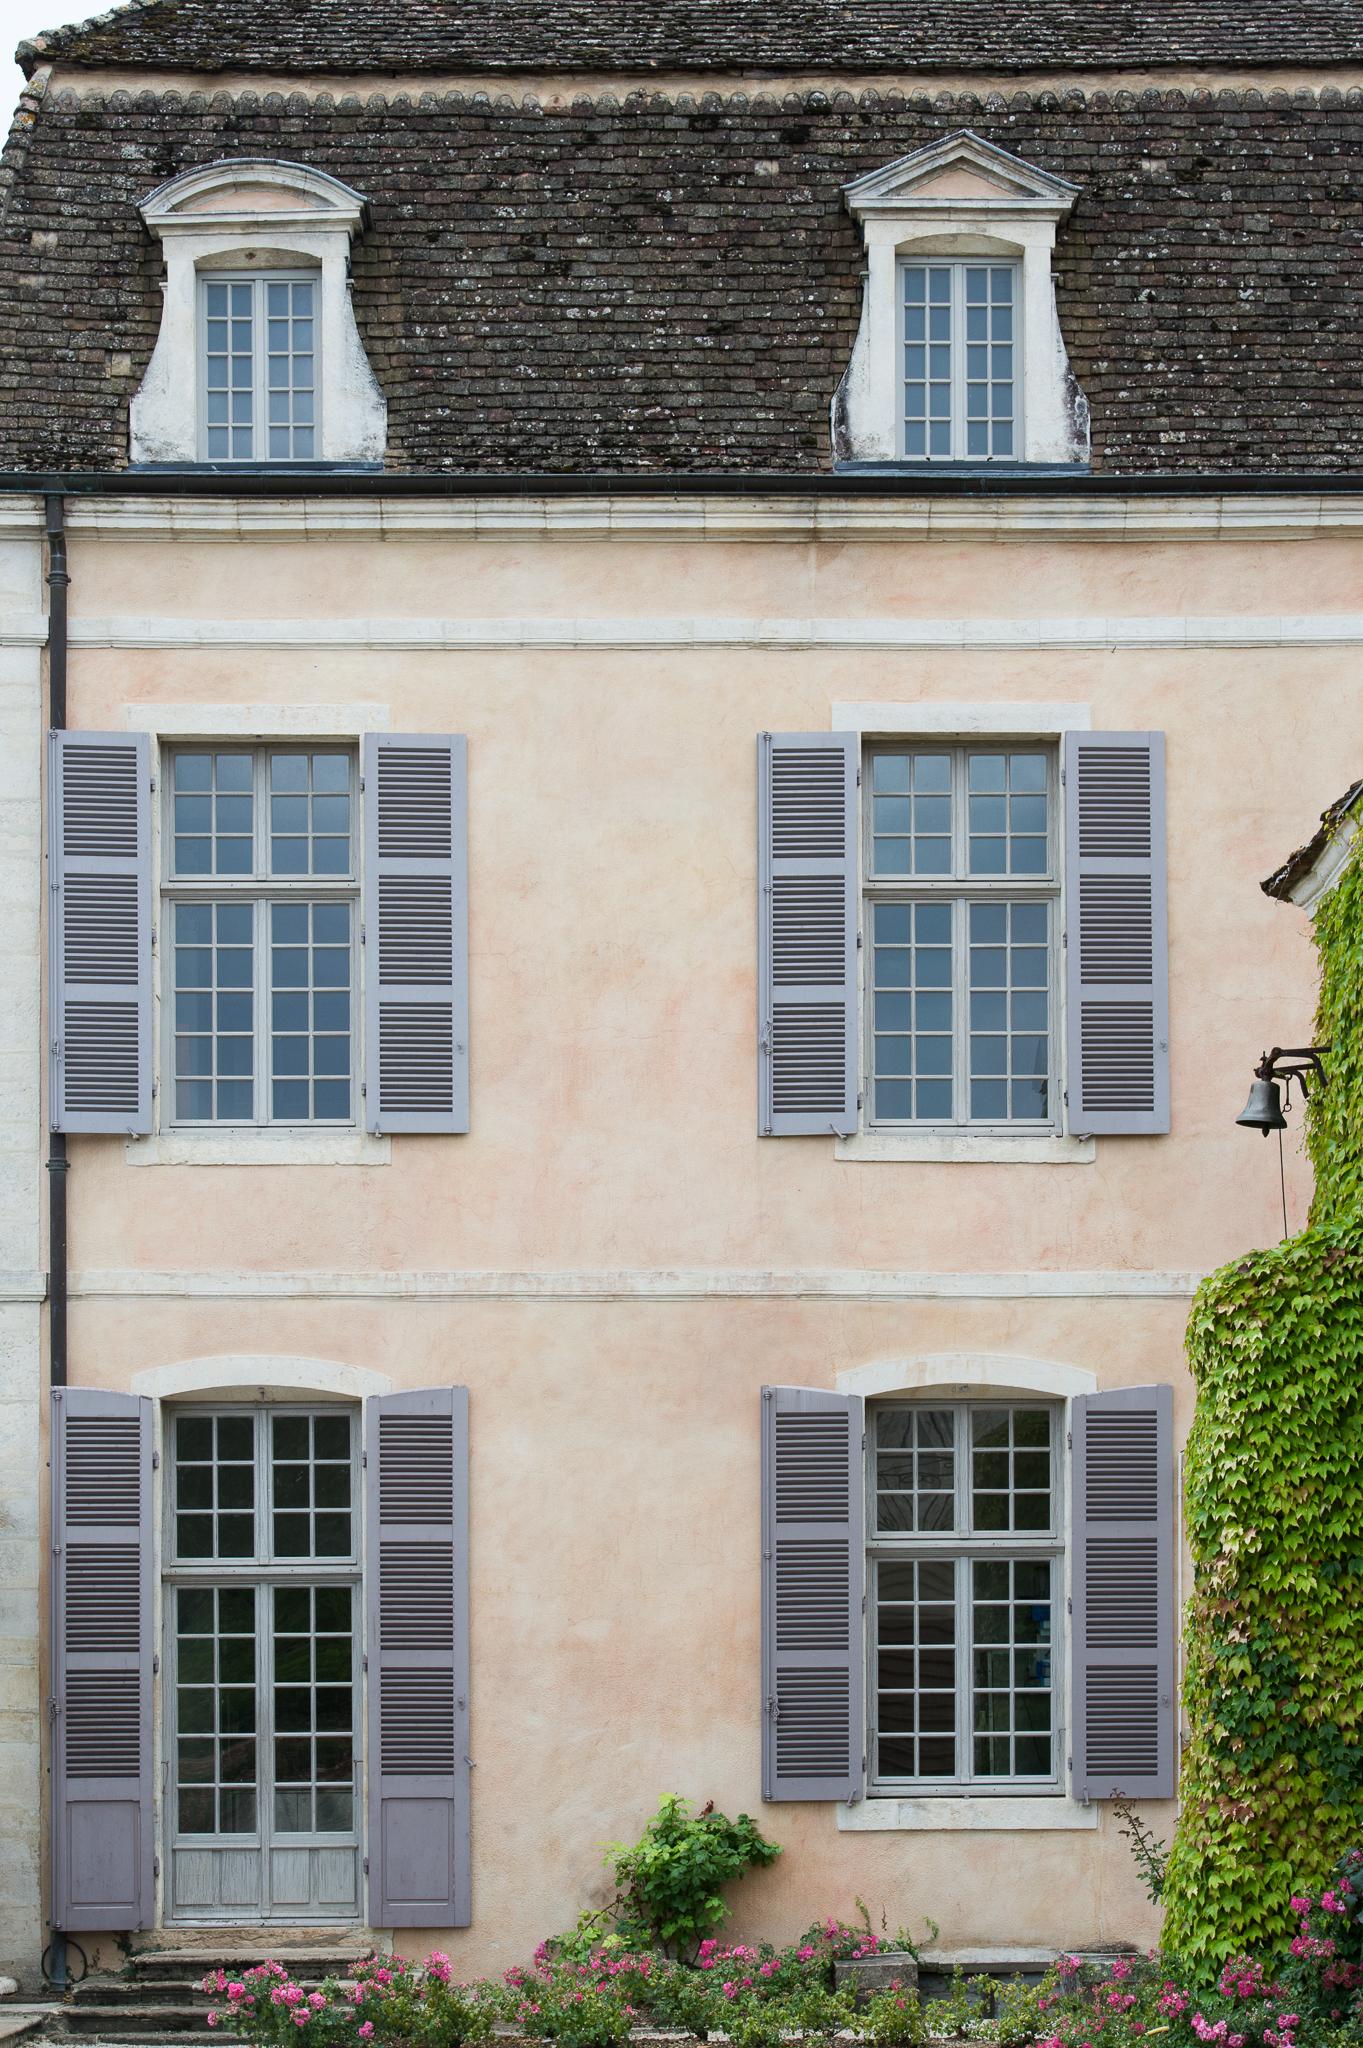 Jason-Davis-Images-Burgundy-0058.jpg